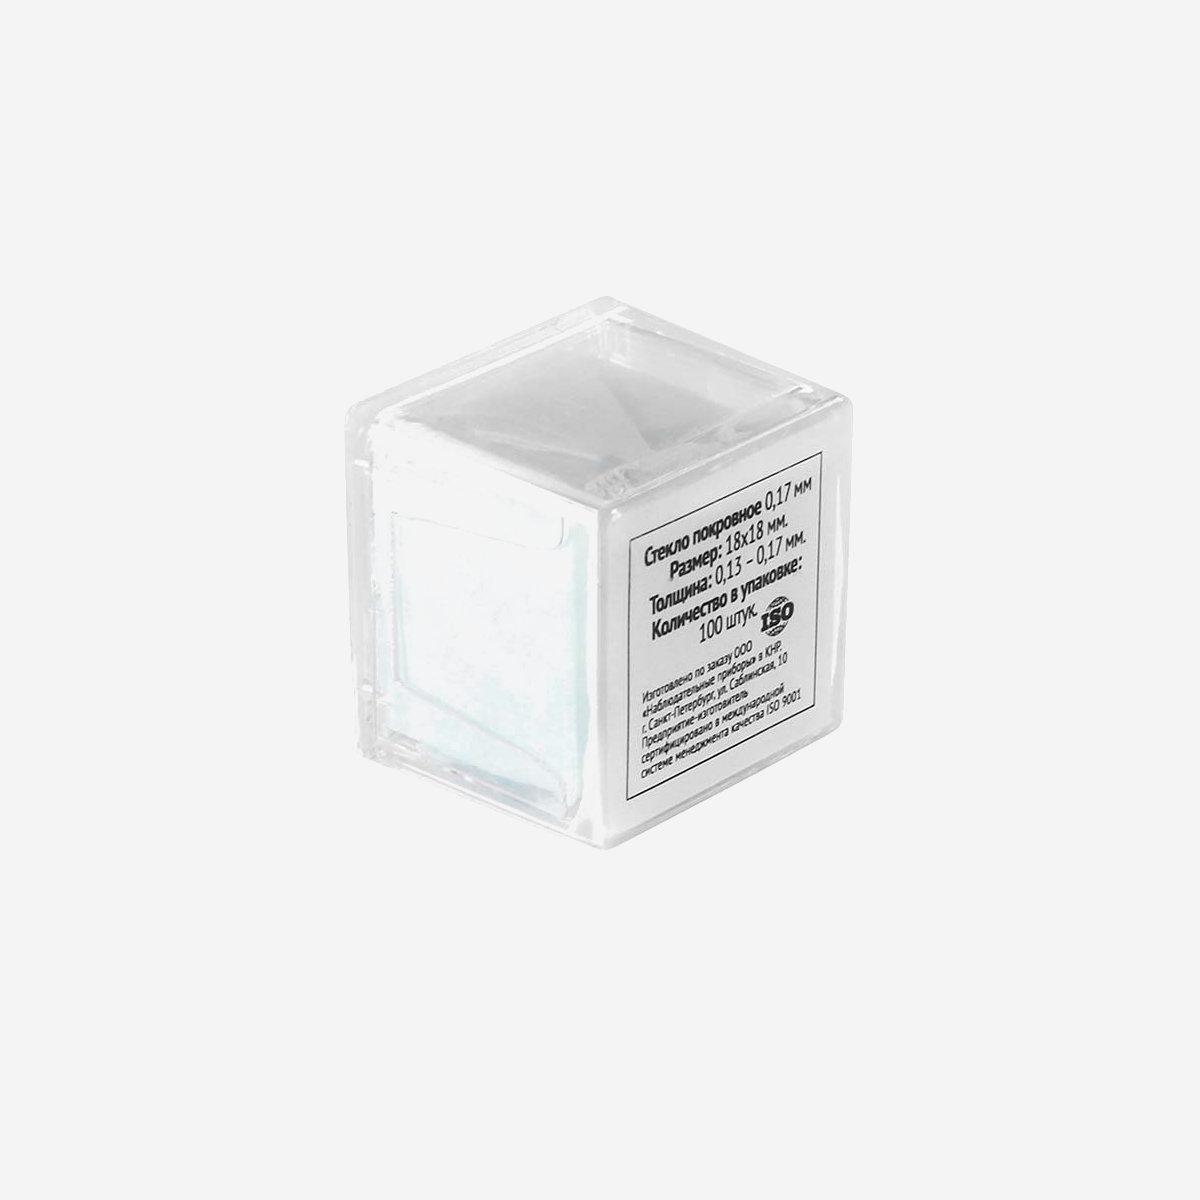 Стекло покровное Микромед 0,17 мм (100 шт.)